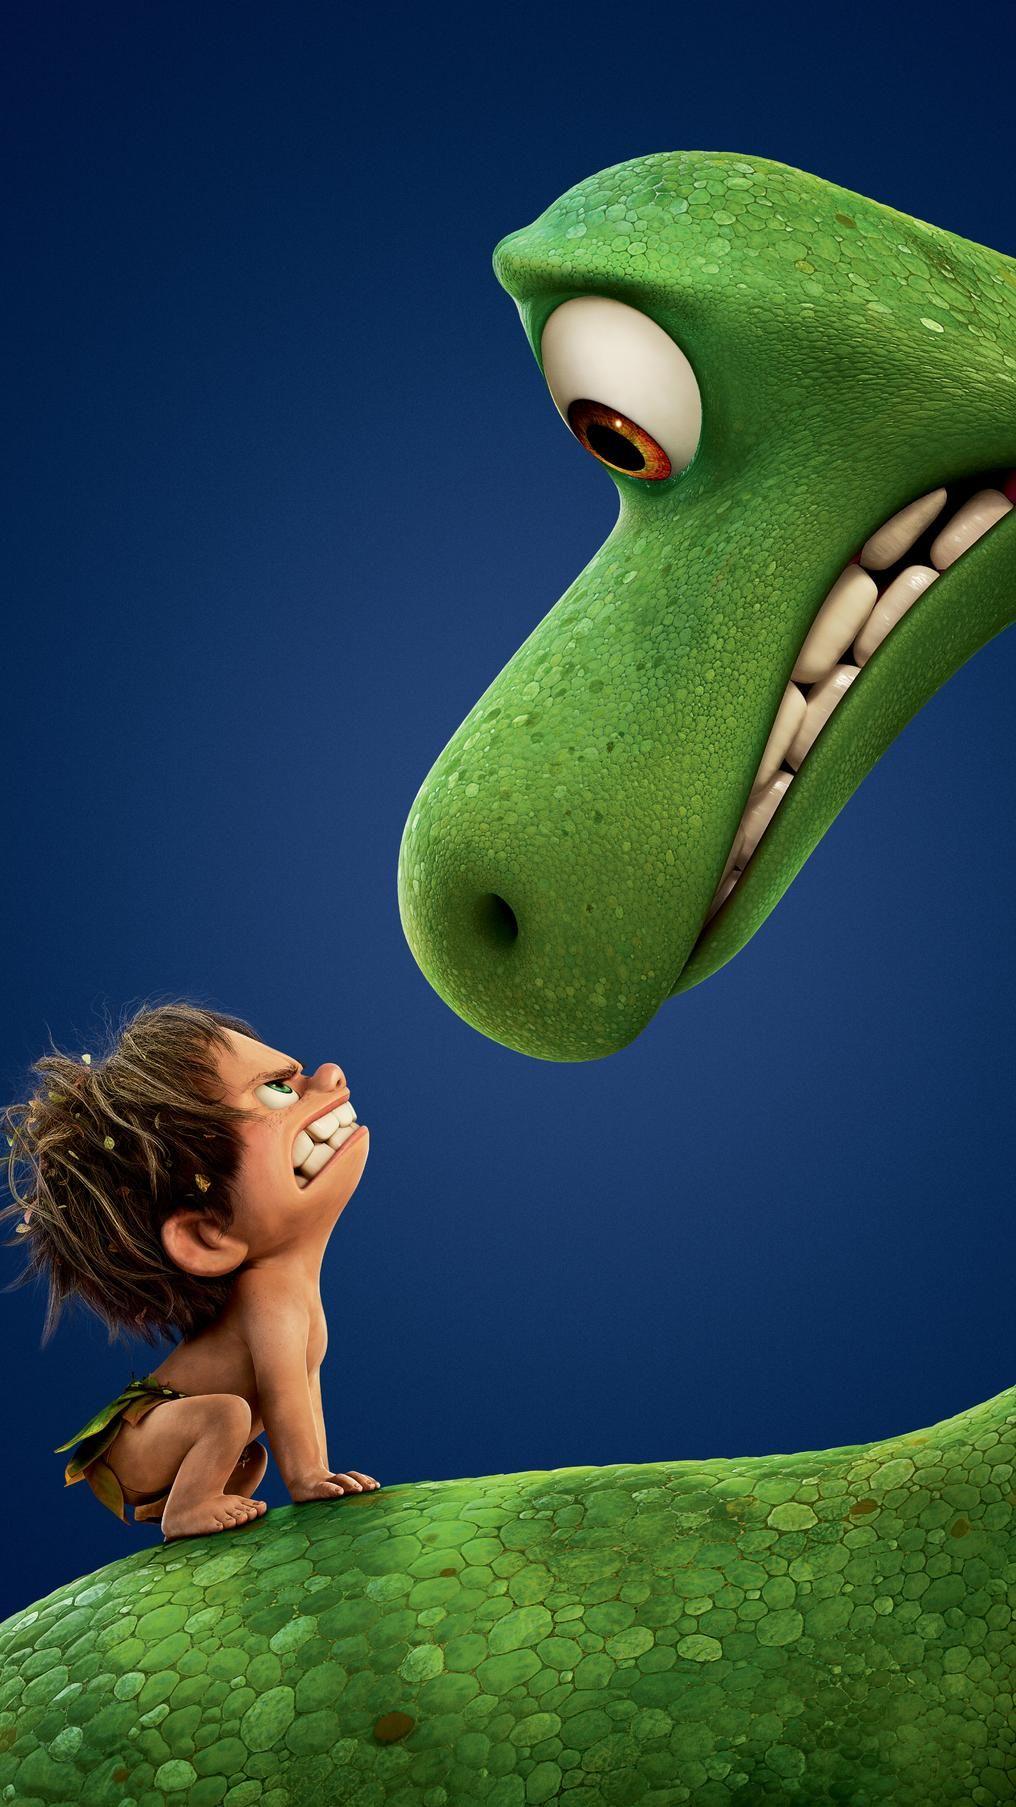 The Good Dinosaur (2015) Phone Wallpaper Disney